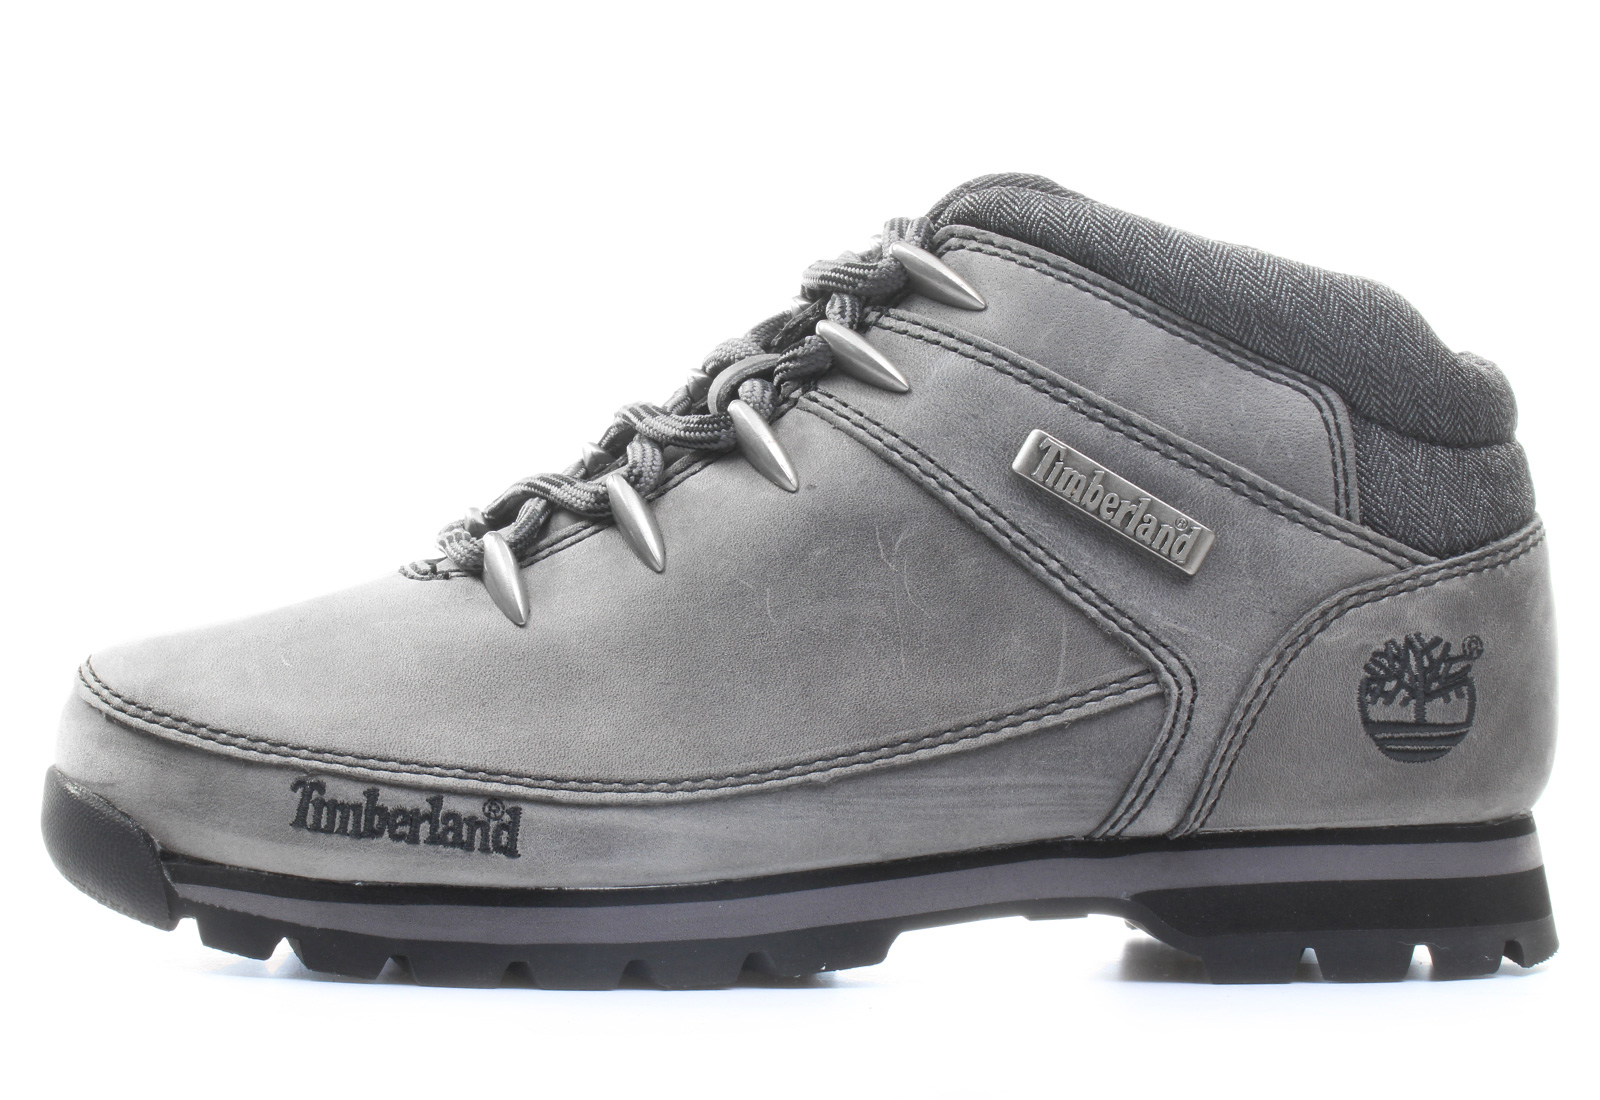 Timberland Topánky - Euro Sprint Hiker - 6709A-GRY - Tenisky ... df41f6ba89c